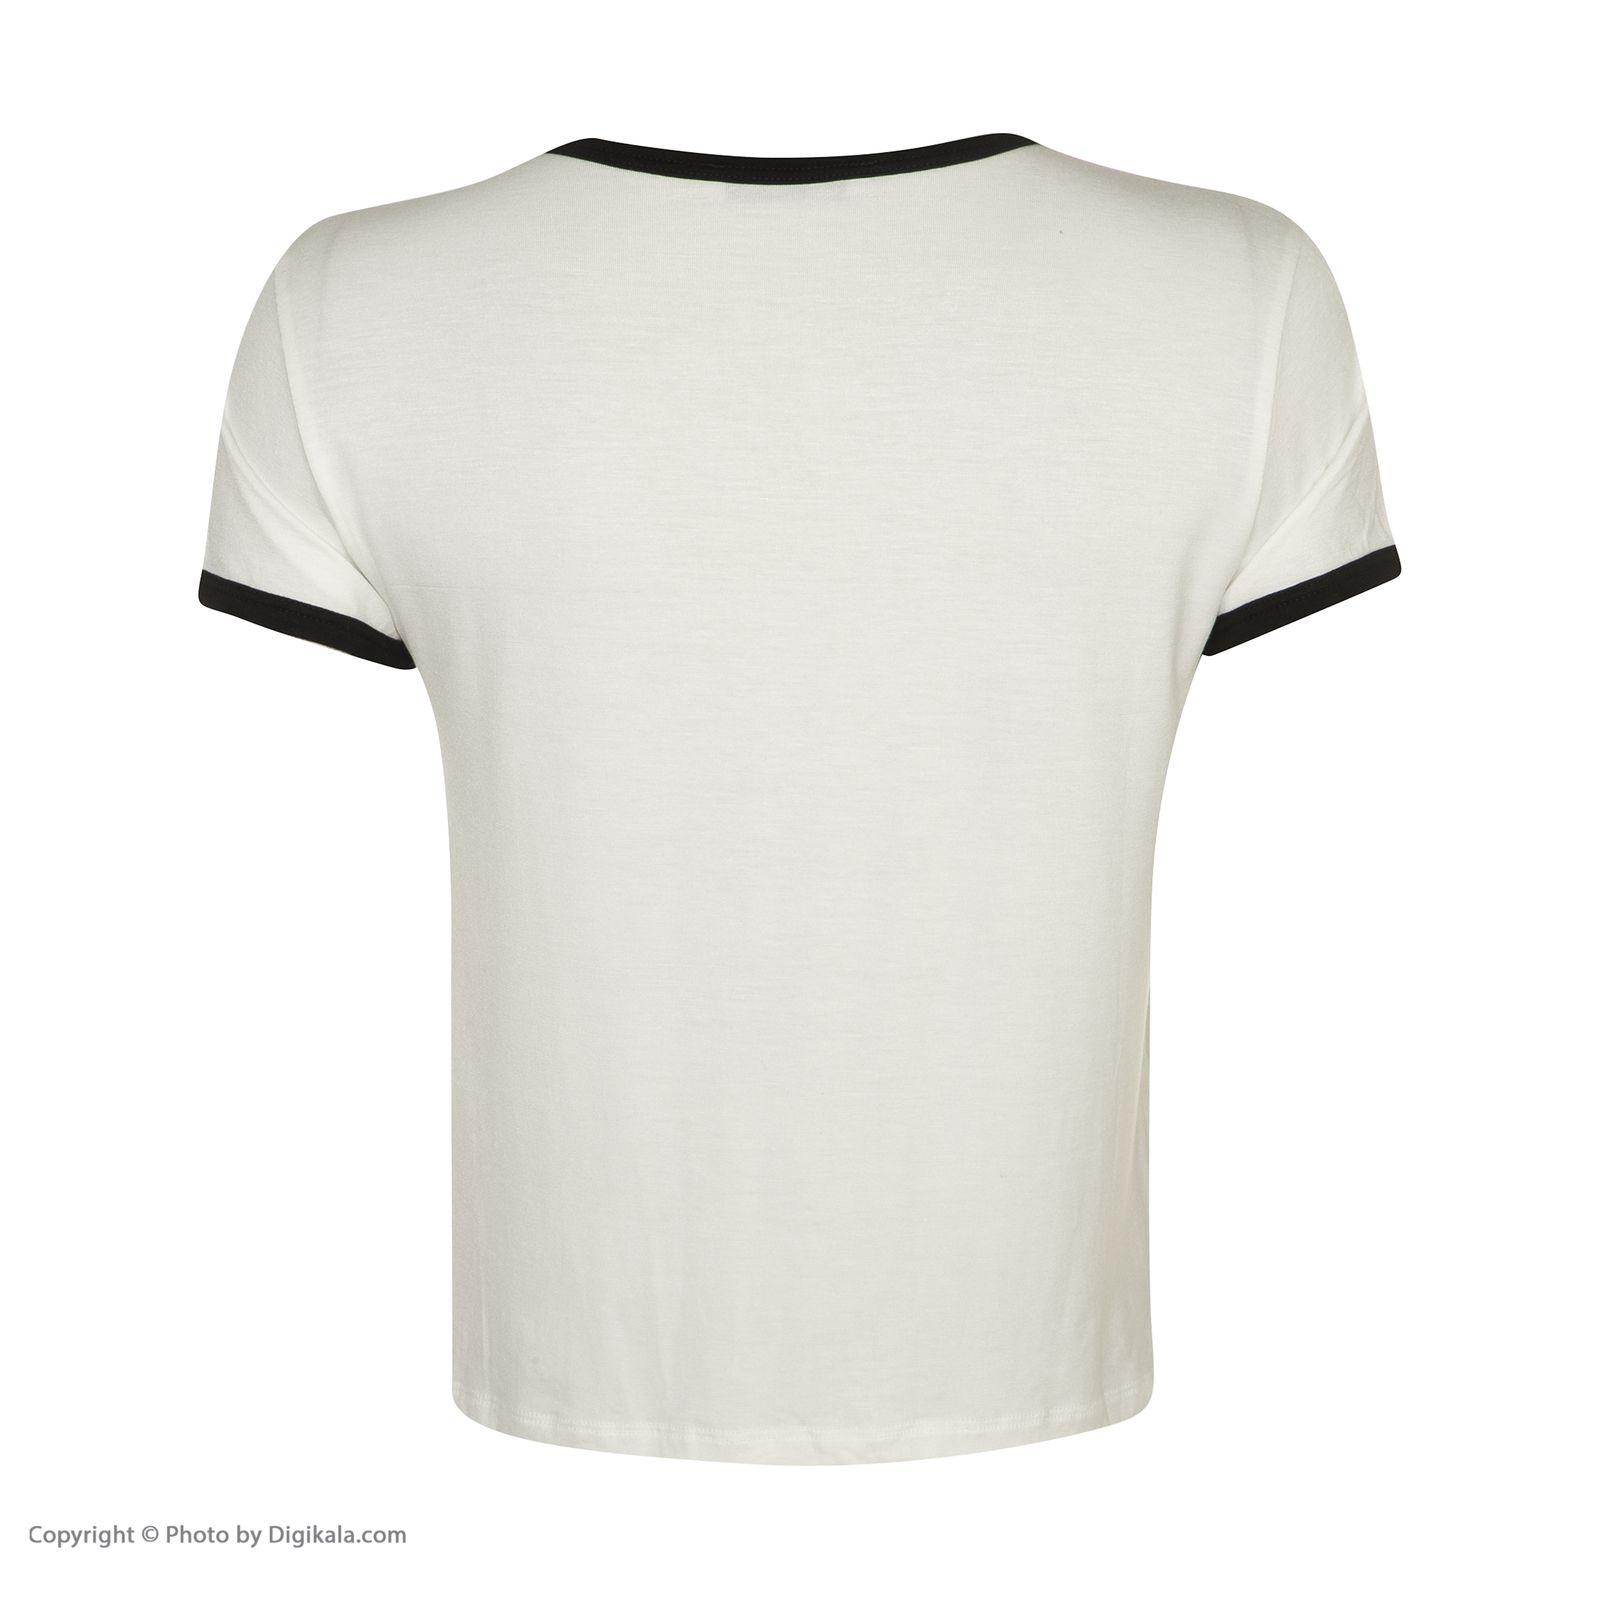 تی شرت زنانه کالینز مدل CL1032902-OFF WHITE main 1 3